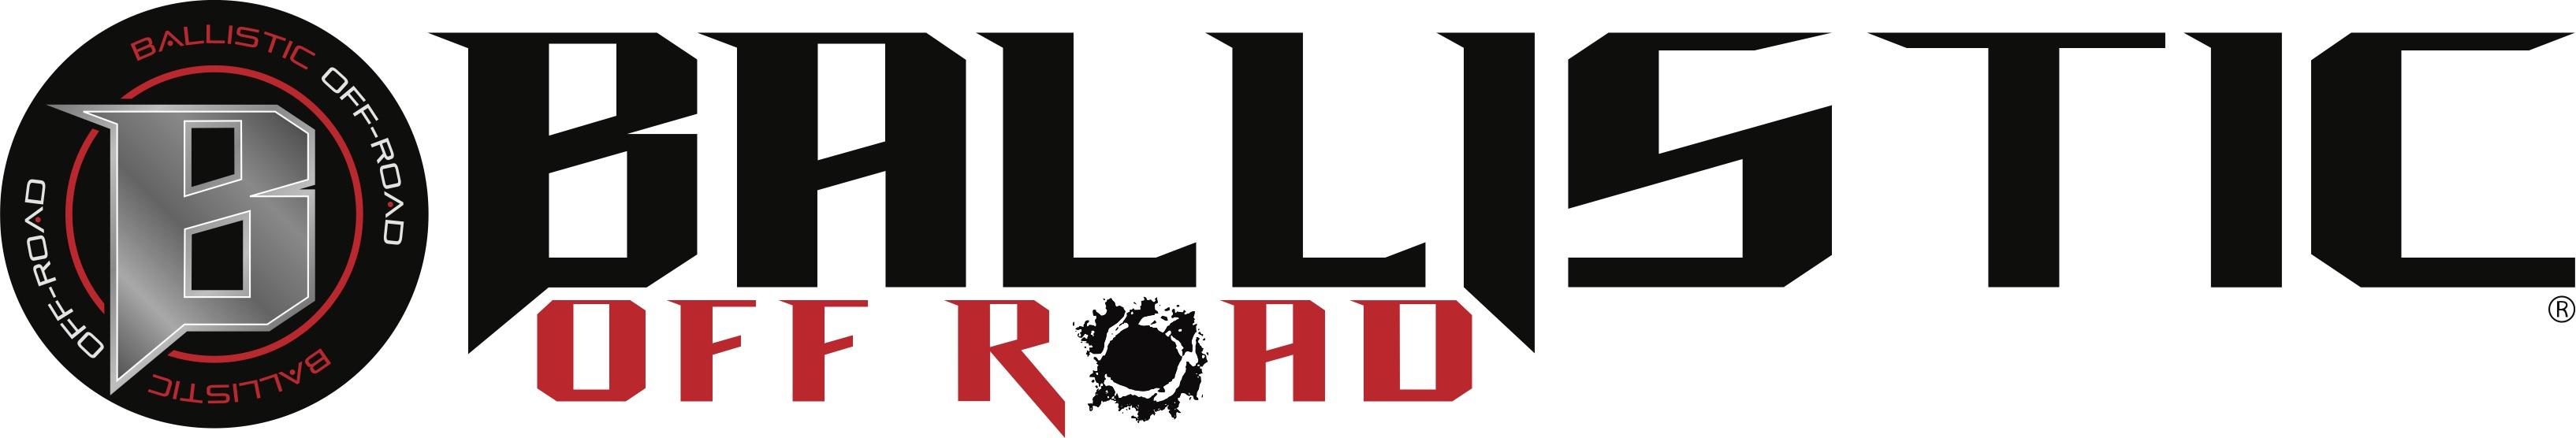 https://www.rc4wd.co.uk/Logo/Ballistic%20logo%20black.jpg